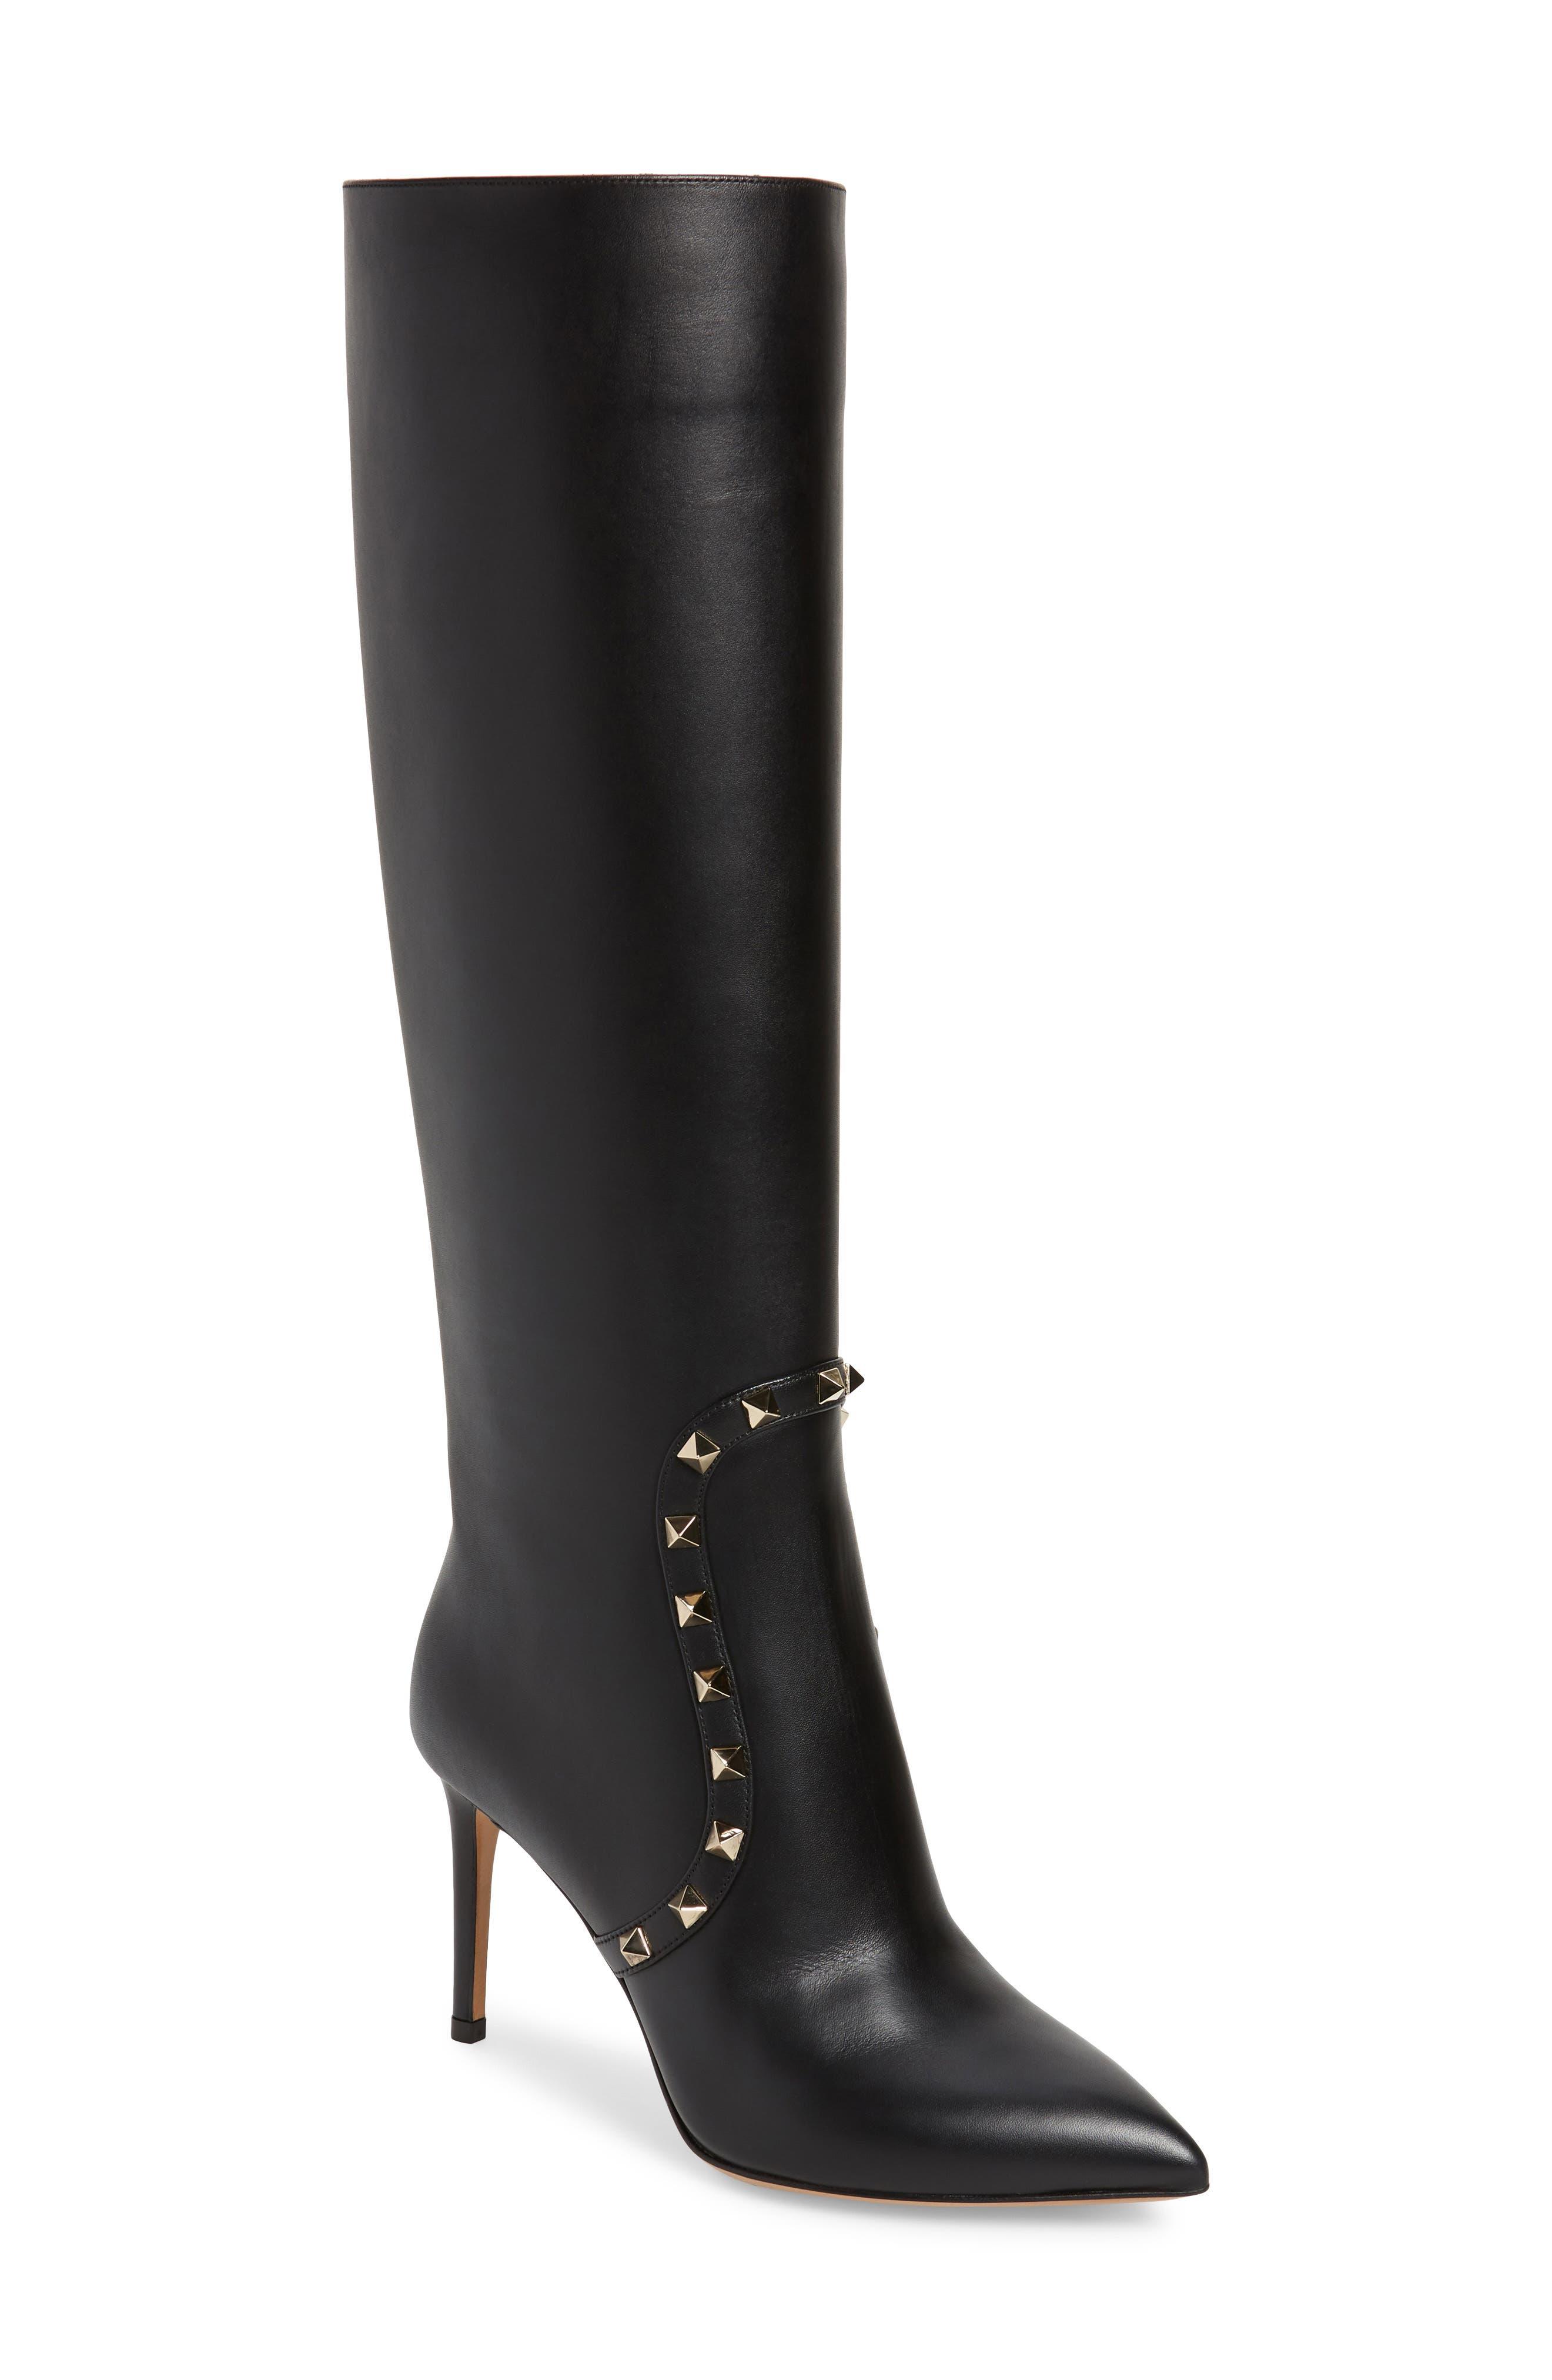 Valentino Garavani Rockstud Knee High Pointed Toe Boot